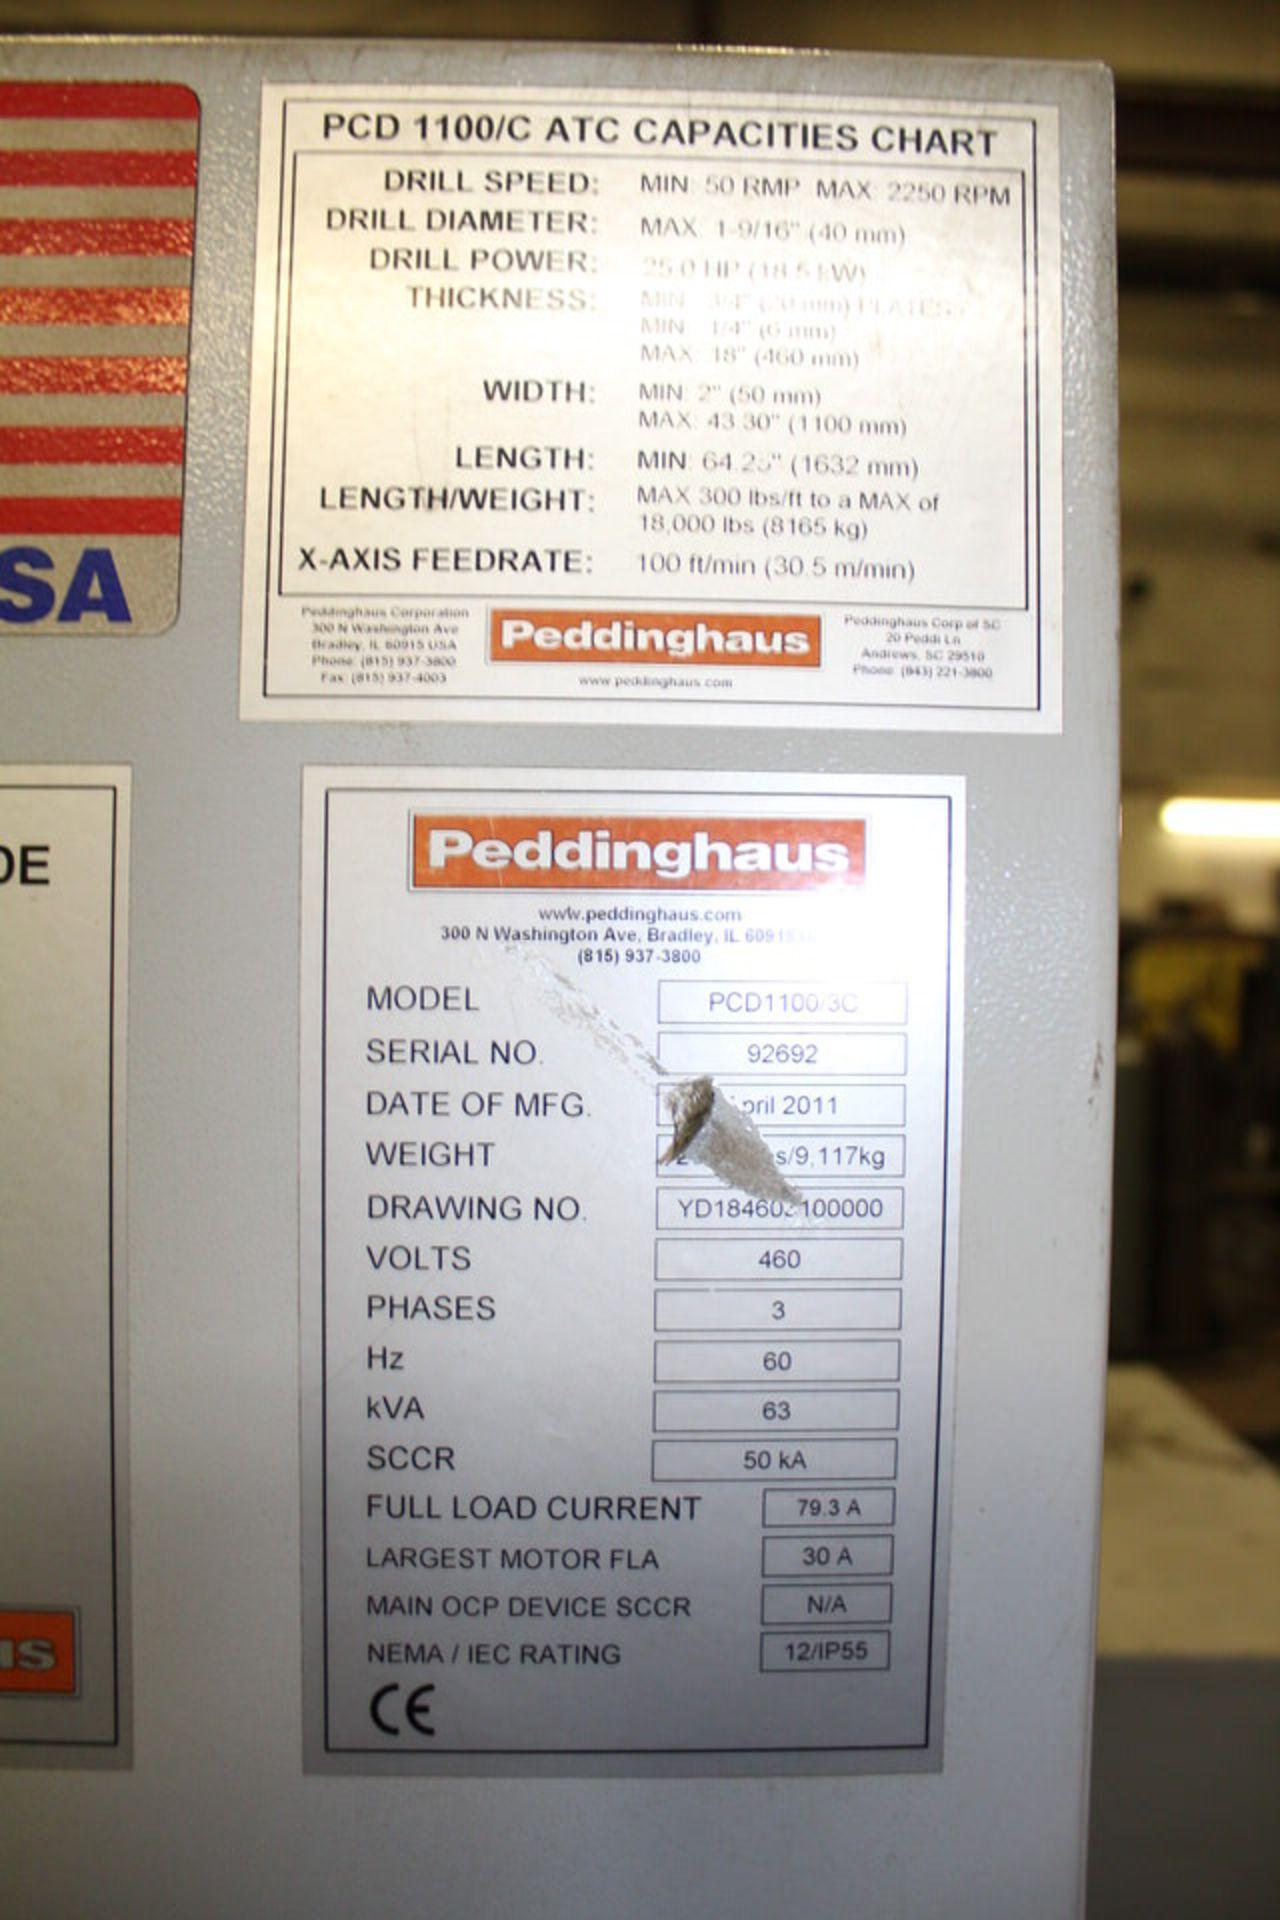 Lot 55A - 2011 PEDDINGHAUS PCD 1100 BEAMDRILL (LOCATION: 4081 EASTSIDE HWY, STEVENSVILLE, MT, 59870)